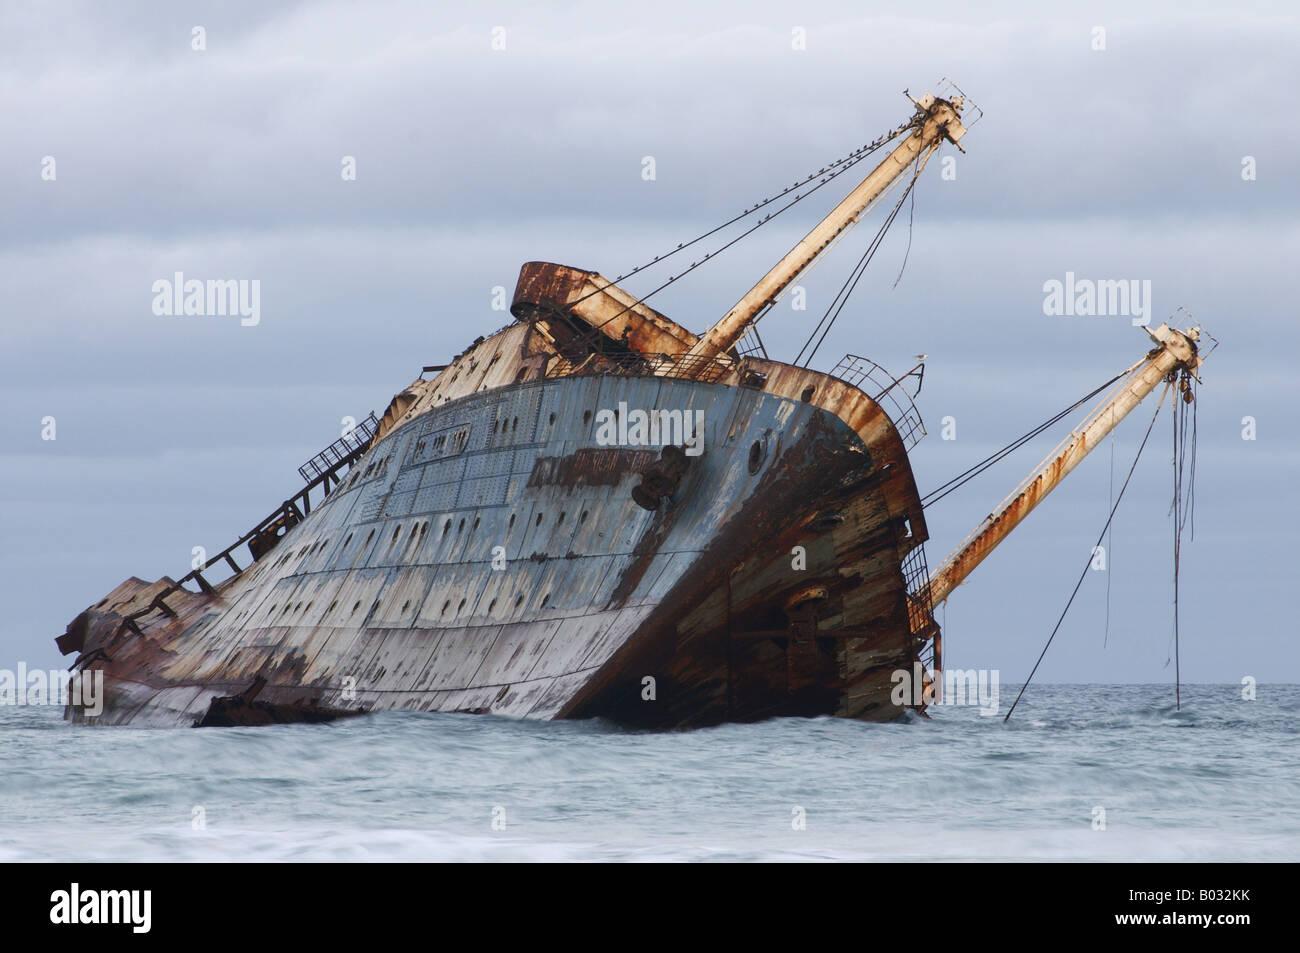 Shipwreck American Star, Fuerteventura - Stock Image